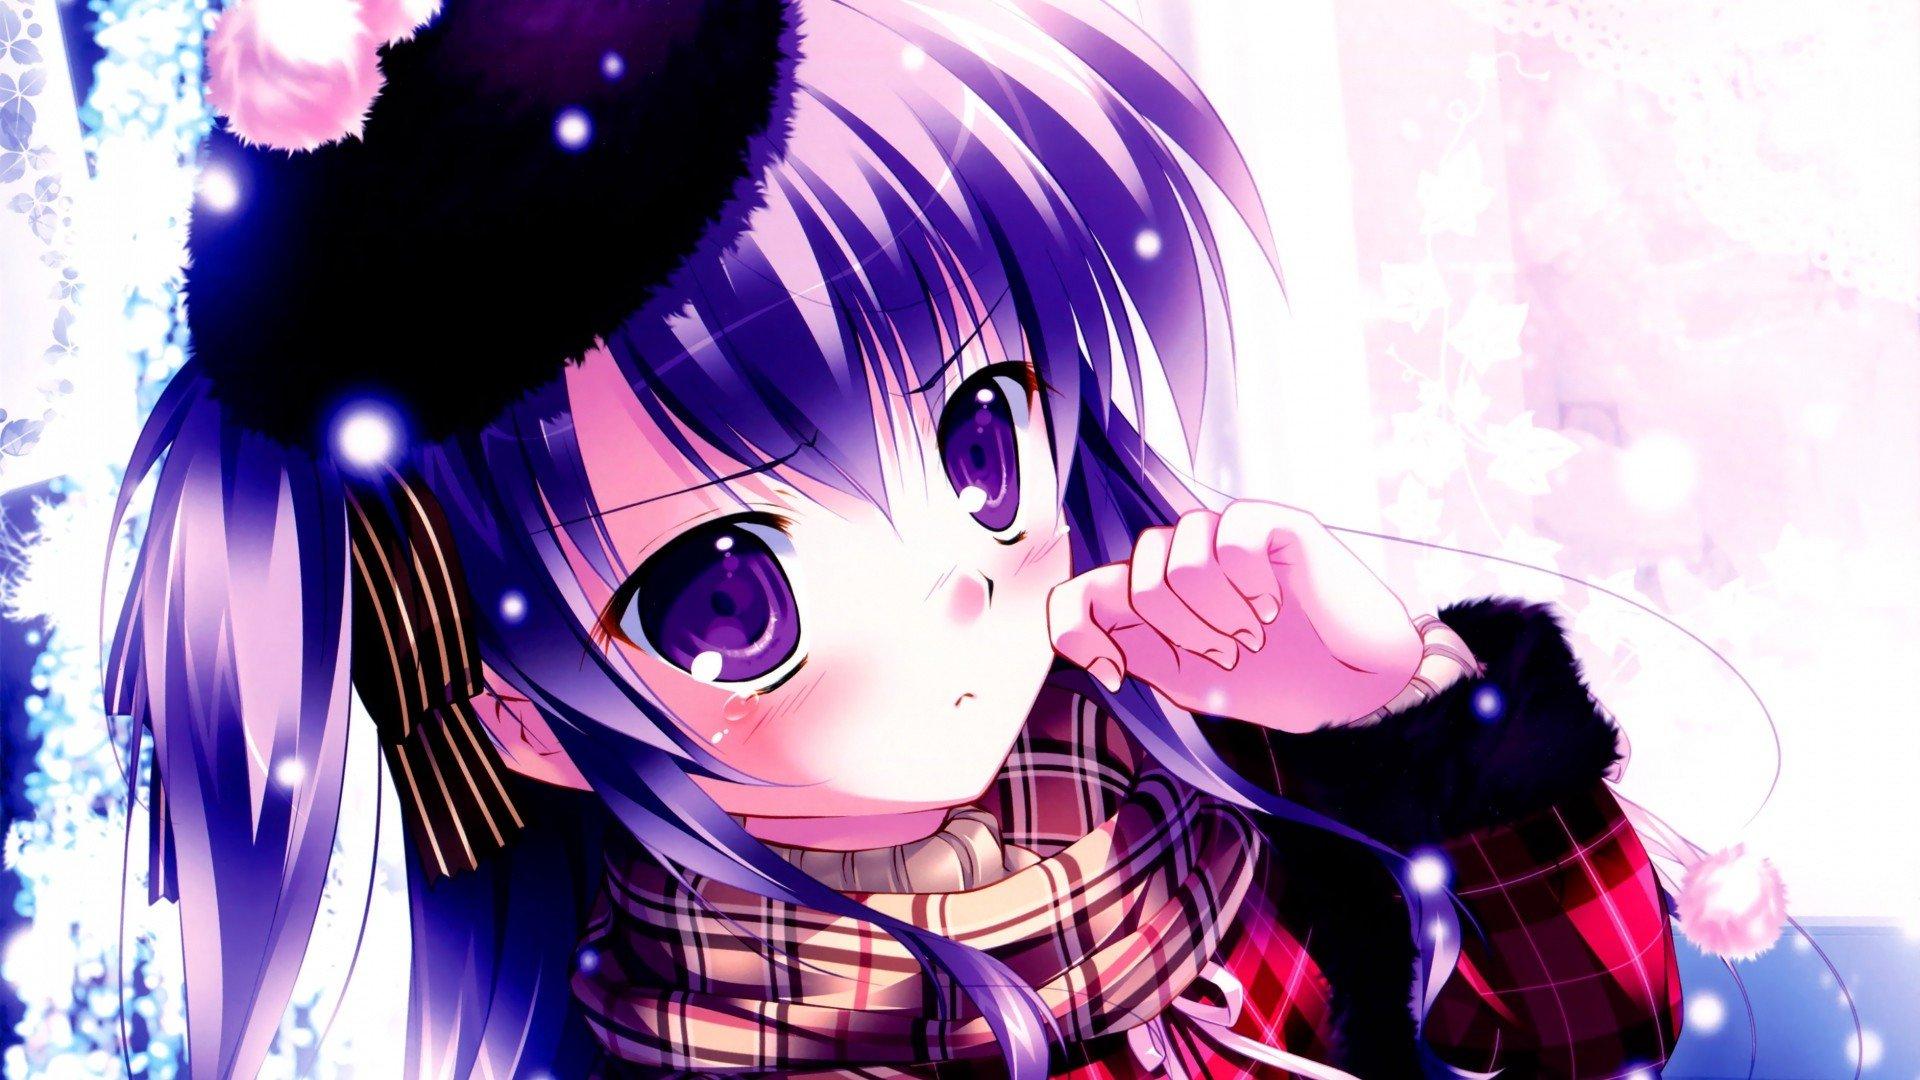 anime girl wallpaper hd 1080p 151410